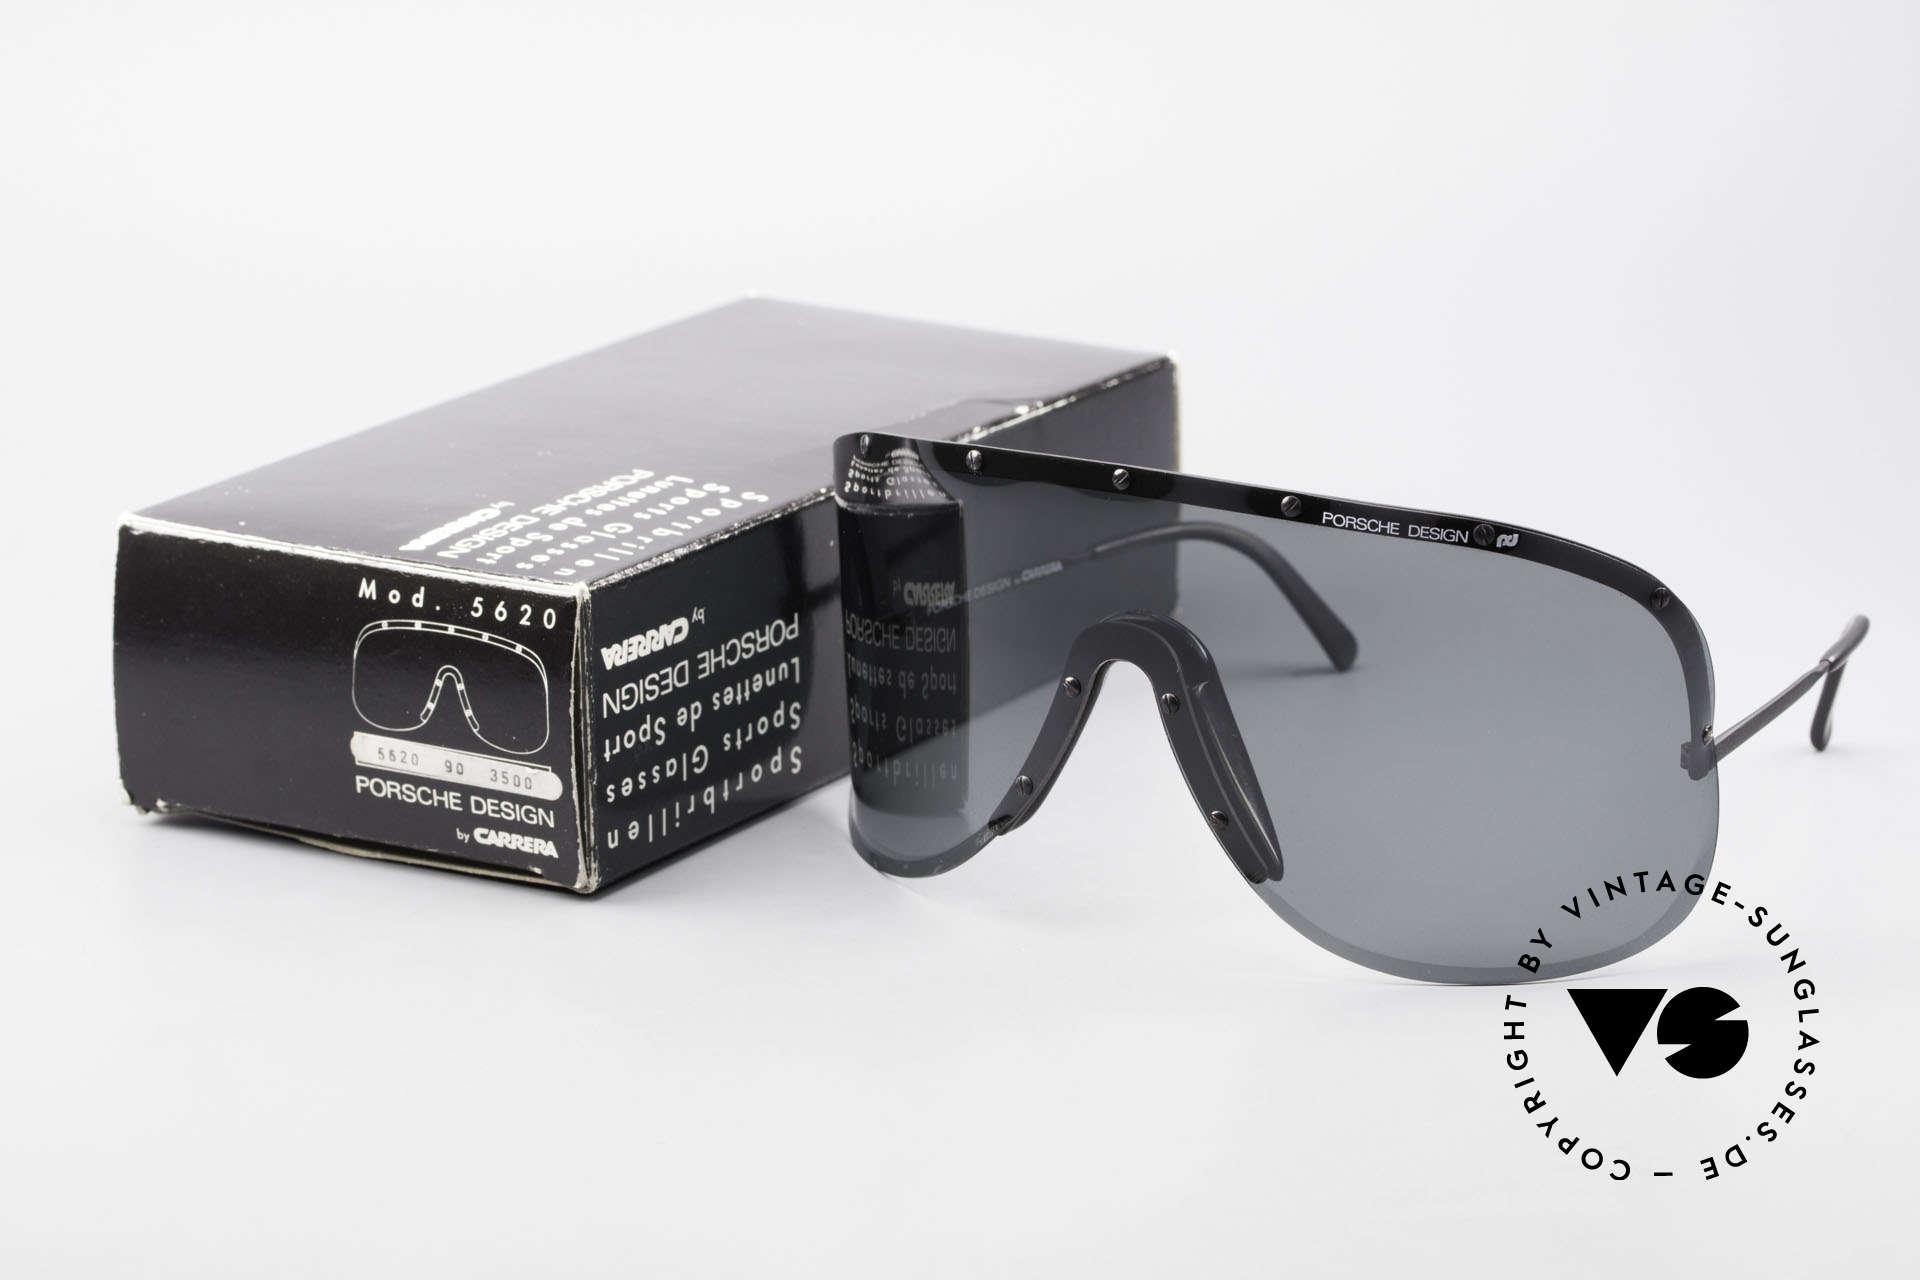 Porsche 5620 80's Yoko Ono Shades Black, original unworn 1980's rarity (comes with orig. packing), Made for Men and Women